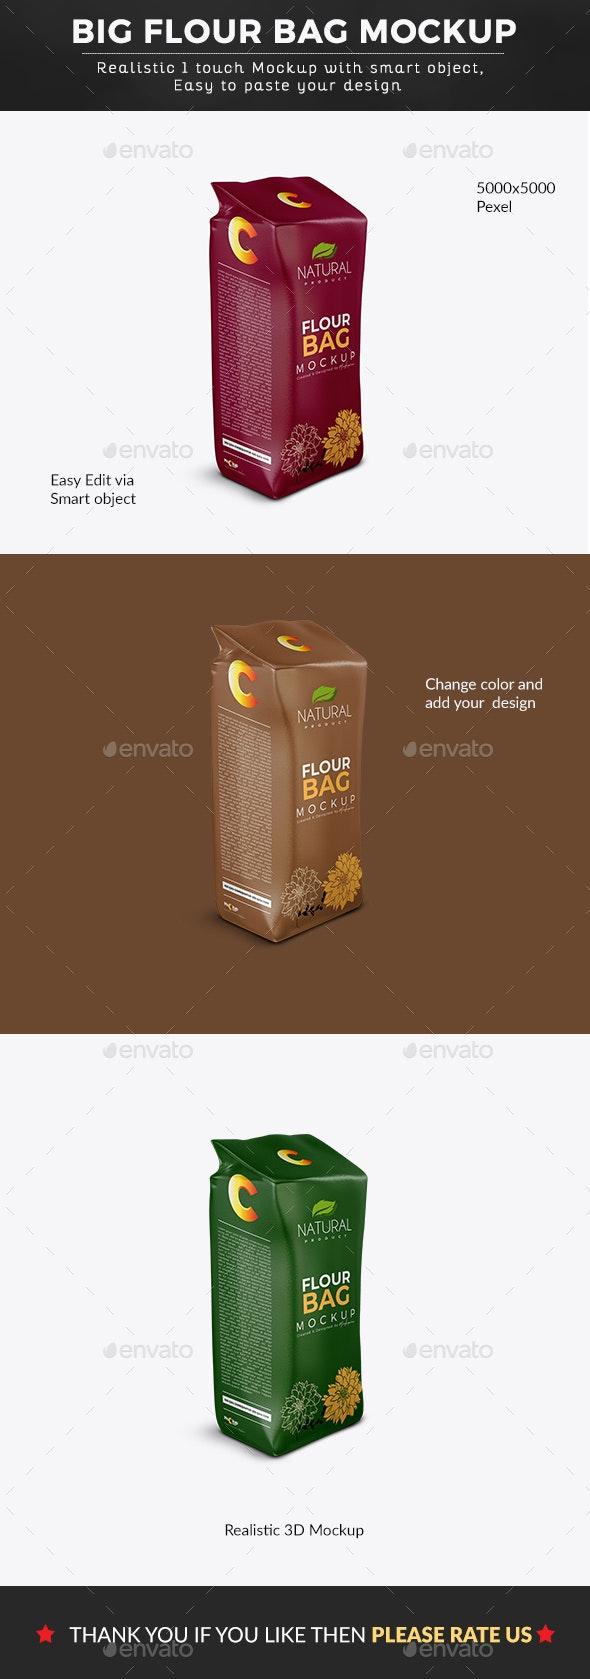 Big Flour Bag Mockup - Graphics